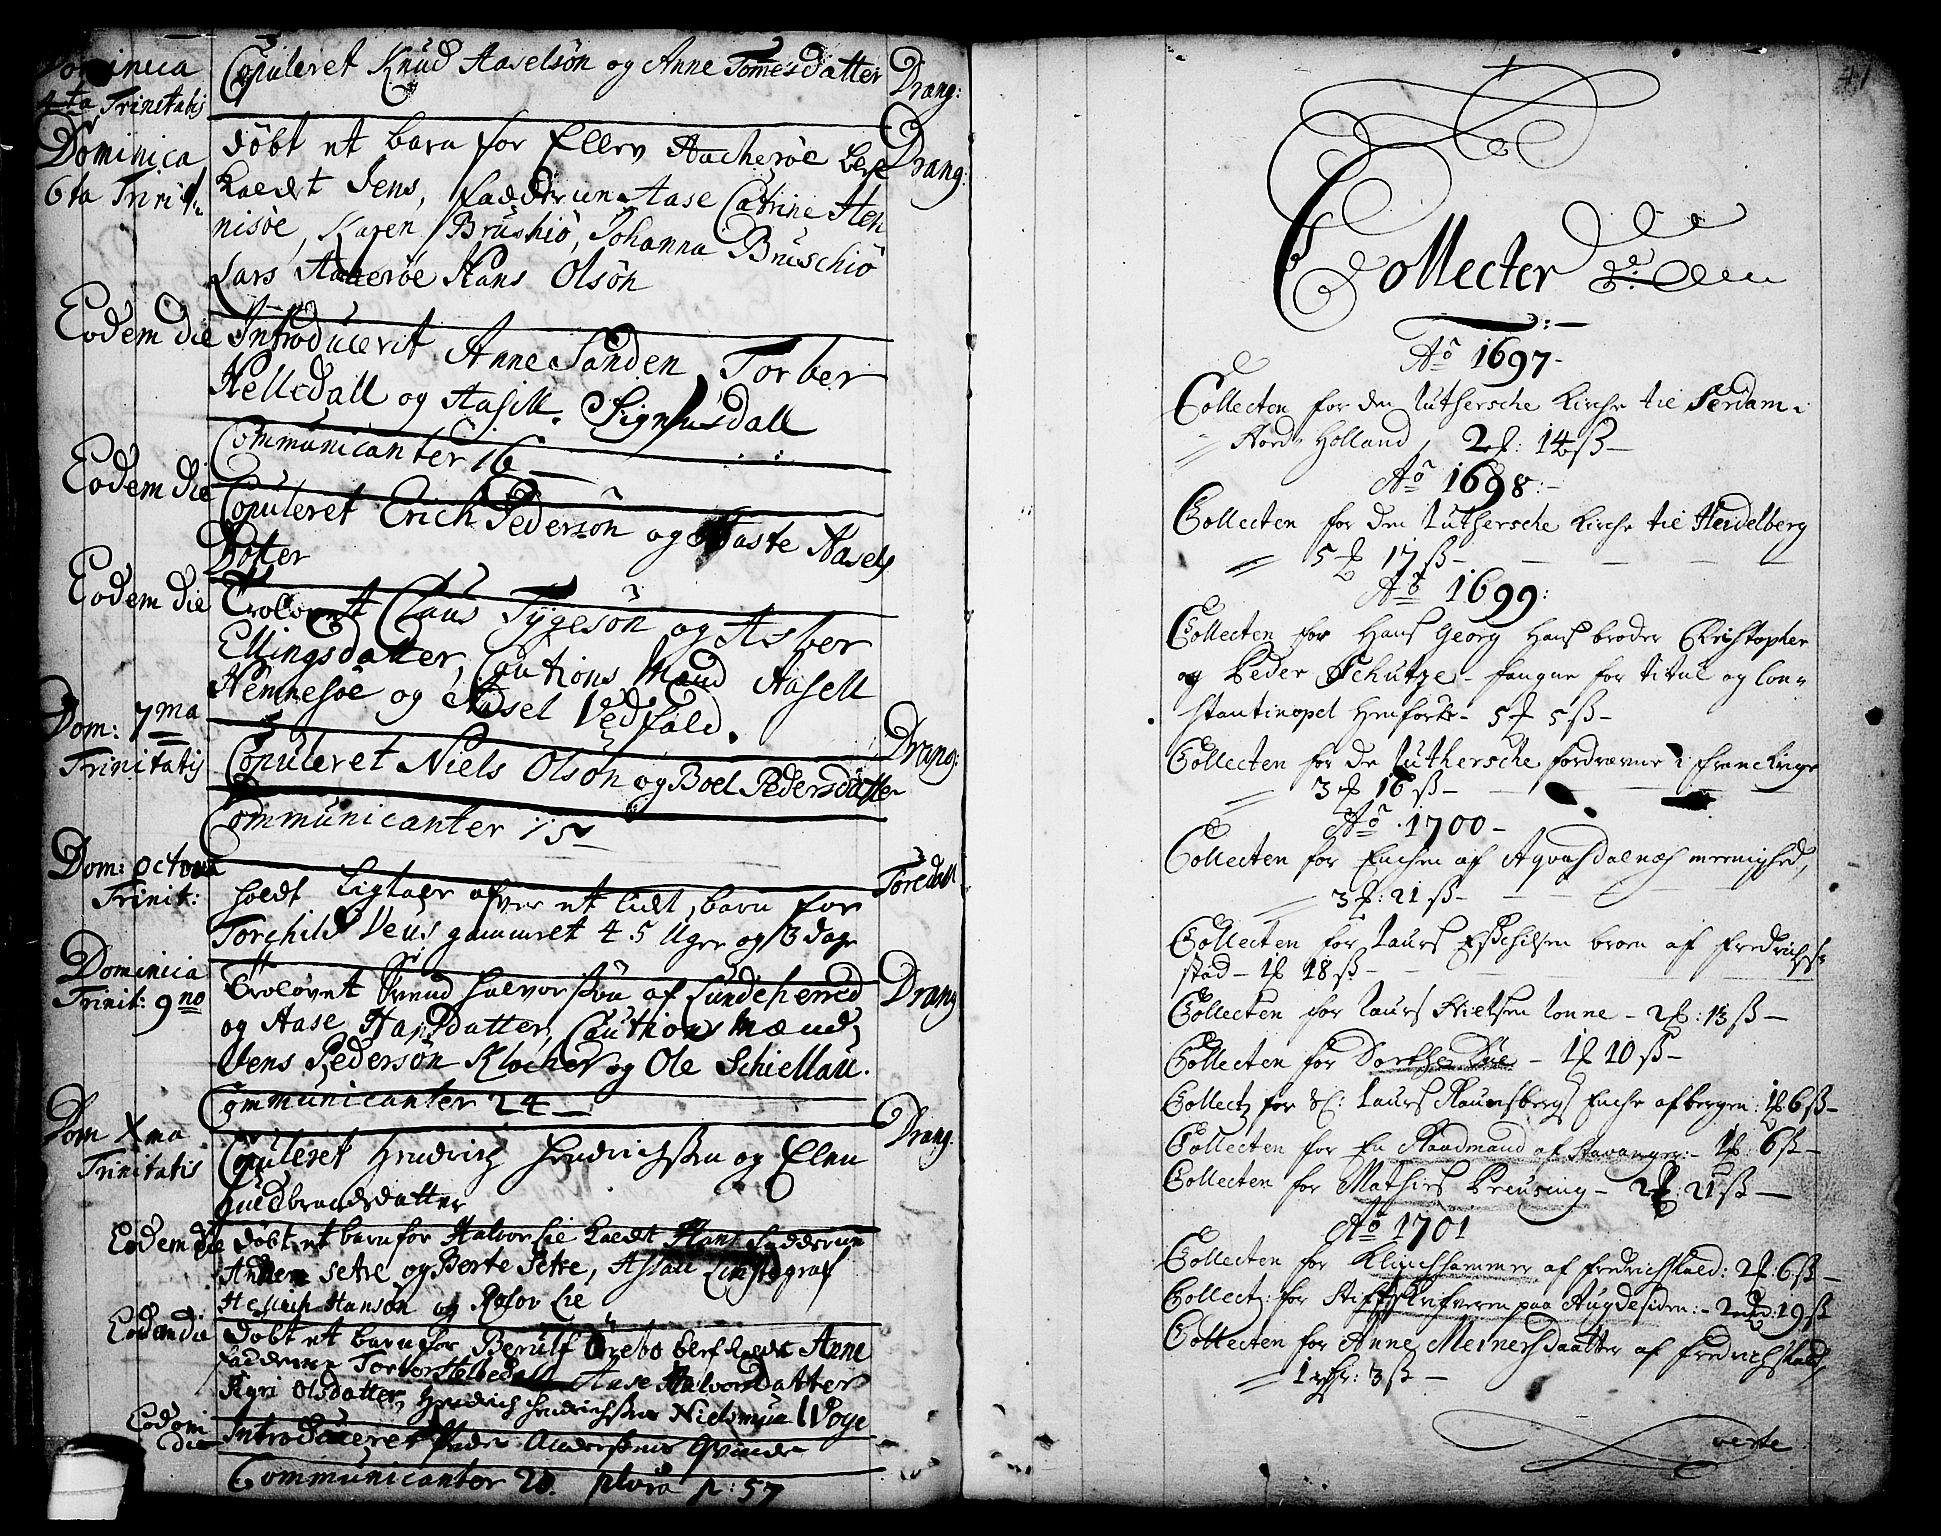 SAKO, Drangedal kirkebøker, F/Fa/L0001: Ministerialbok nr. 1, 1697-1767, s. 41